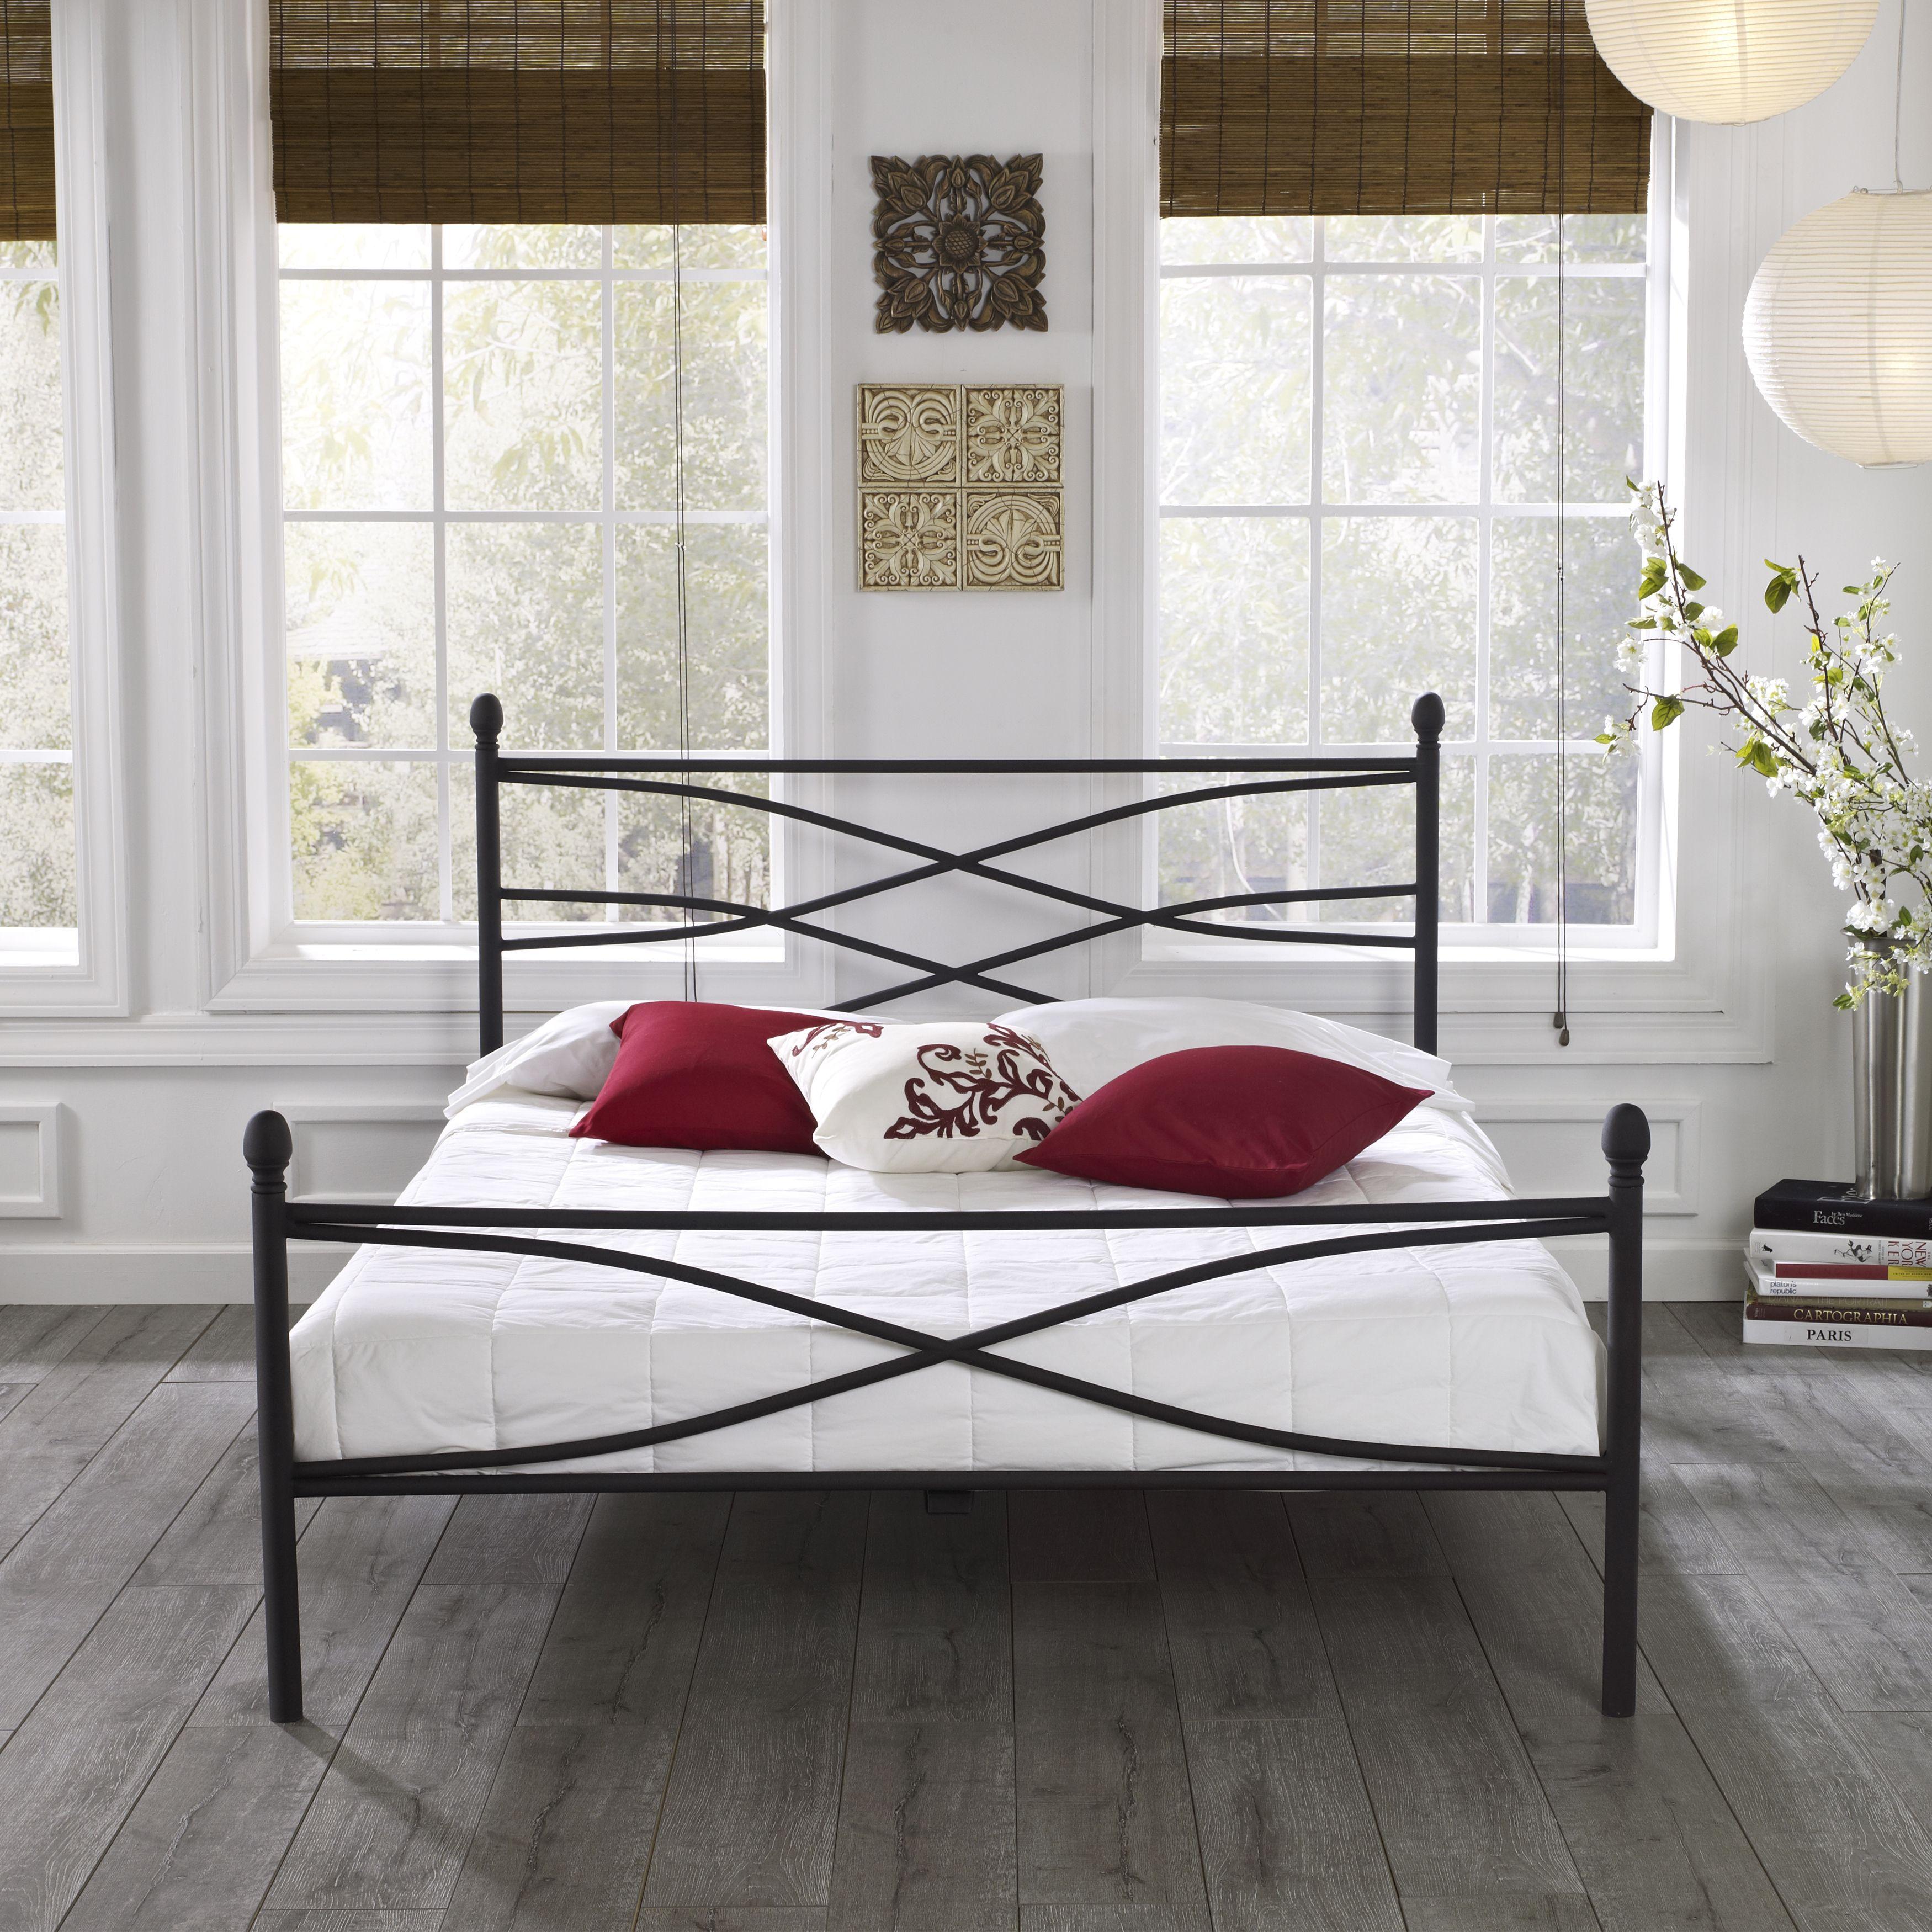 Sleep Sync Leesport Platform Bed | Compras, Negro y Negro mate